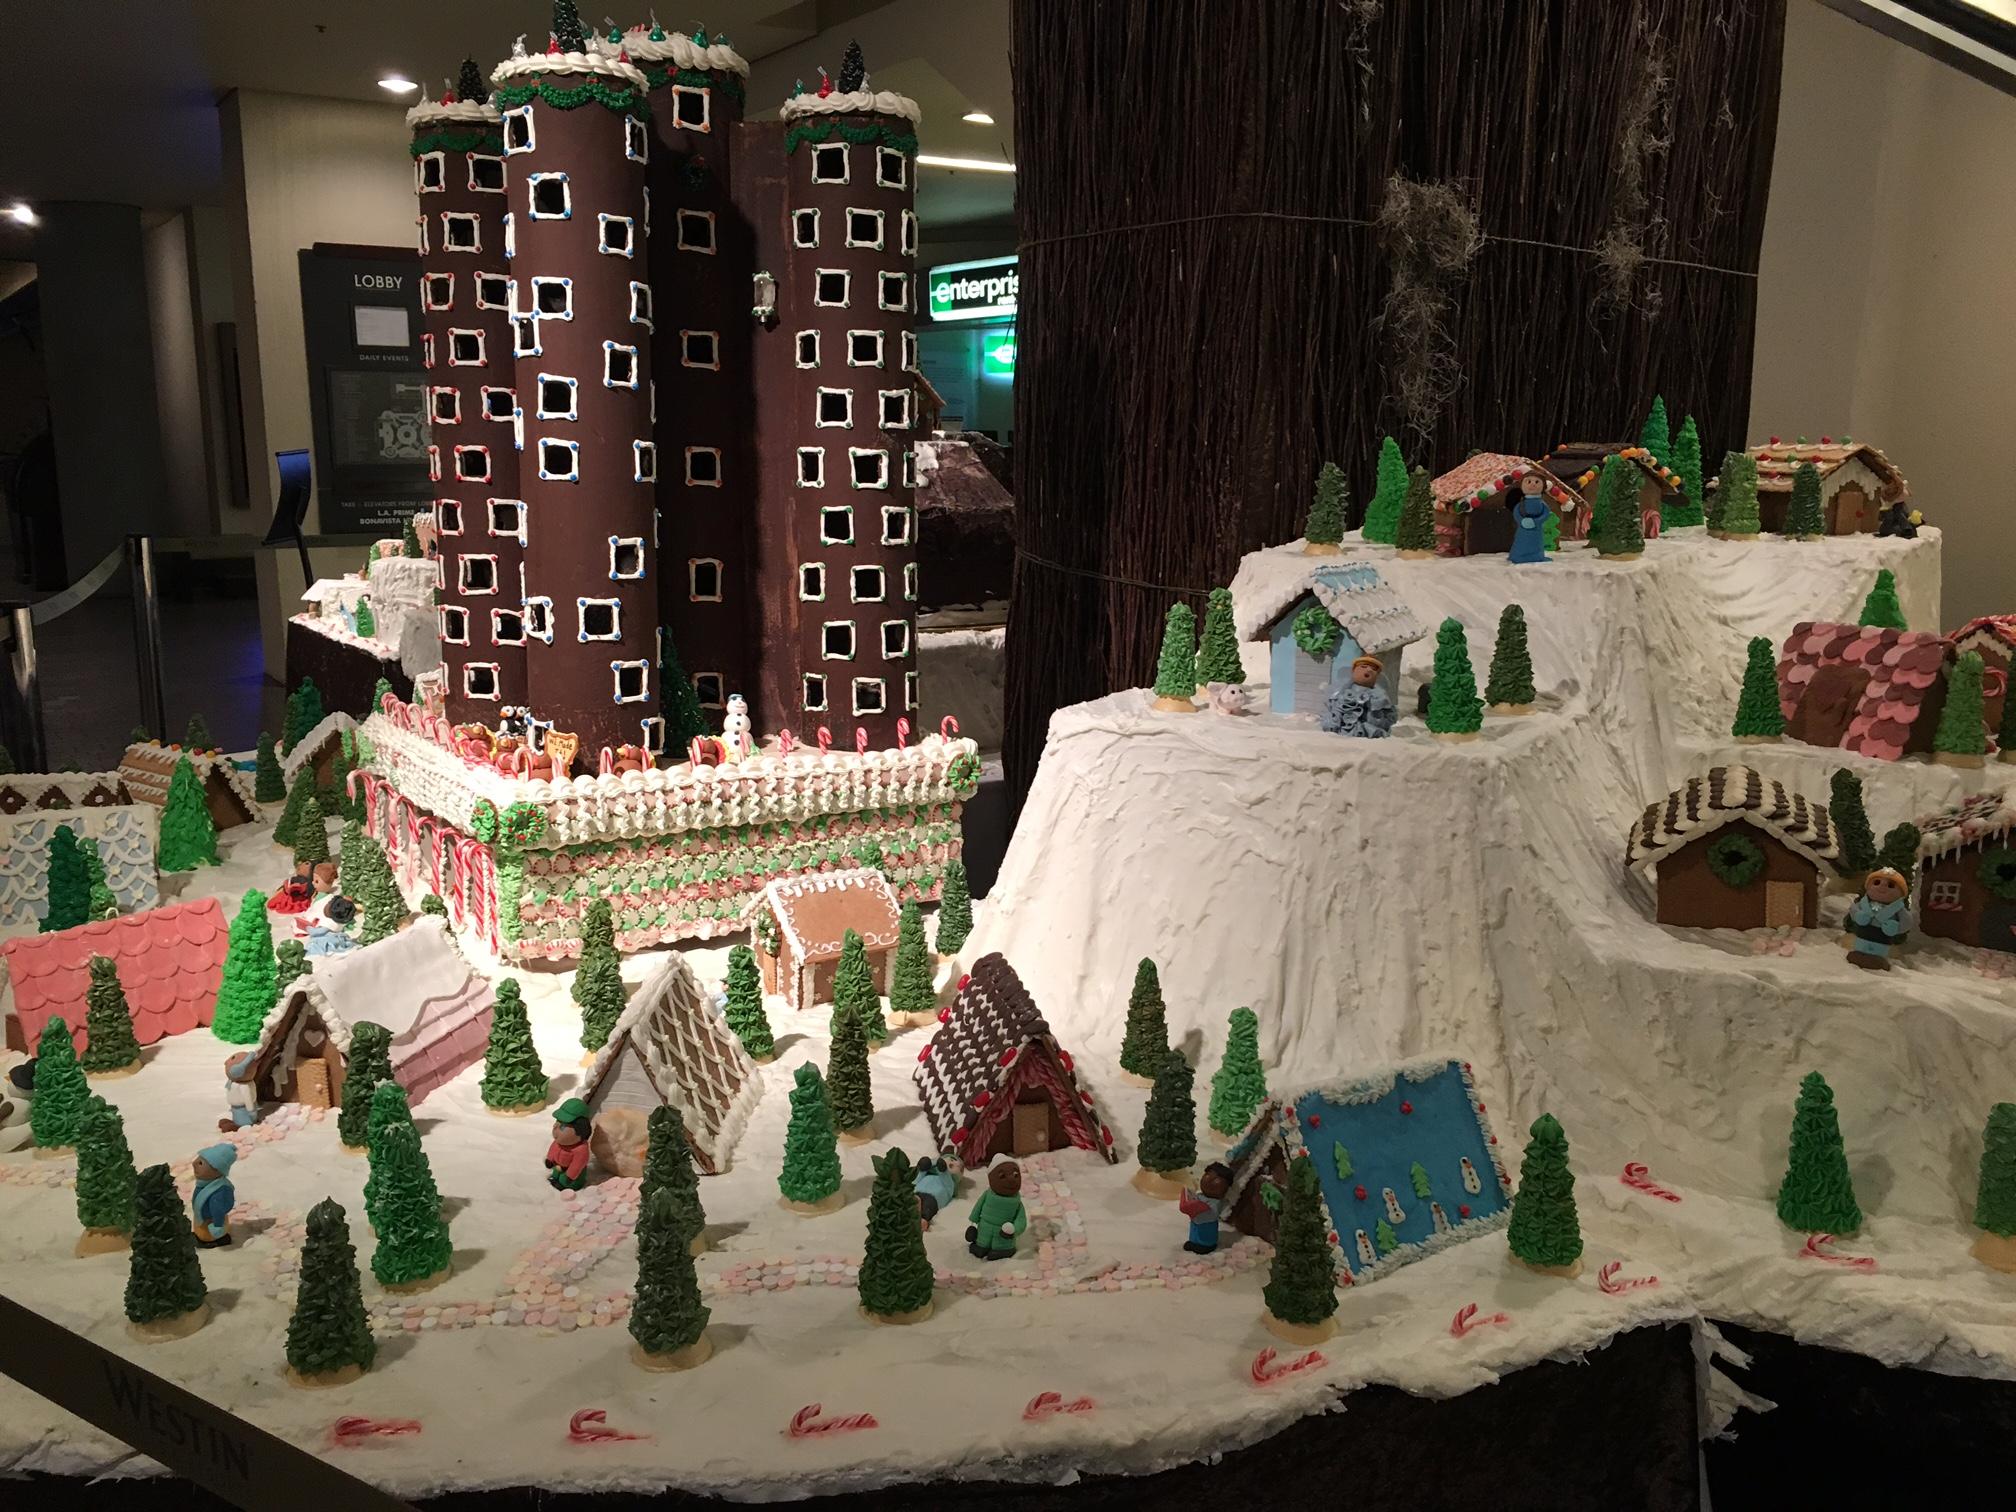 Gingerbread village at the Bonaventure Hotel